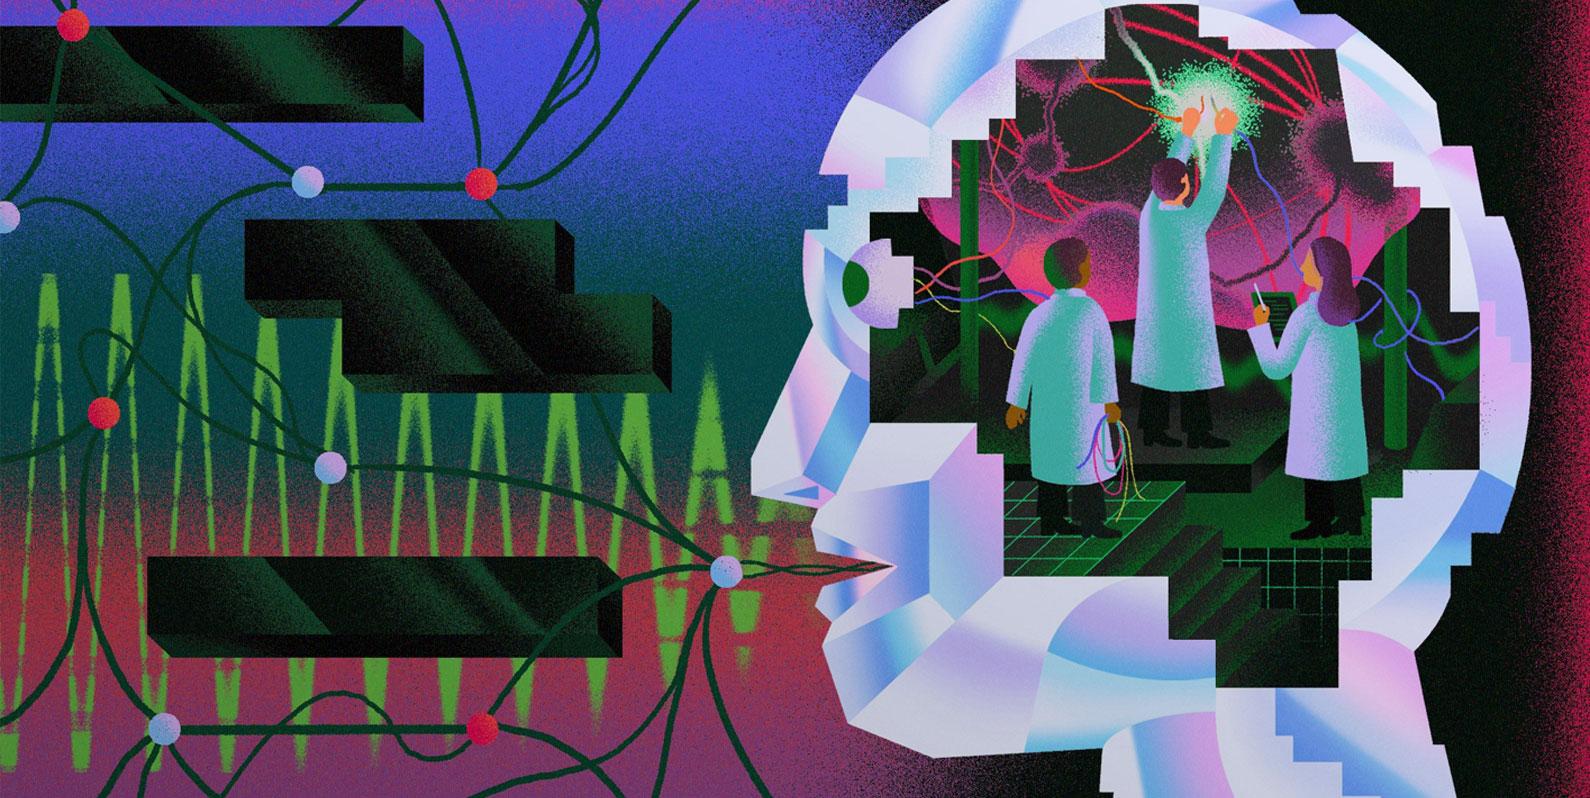 A corrida para entender o mundo emocionante e perigoso dos modelos de linguagem para Inteligência Artificial